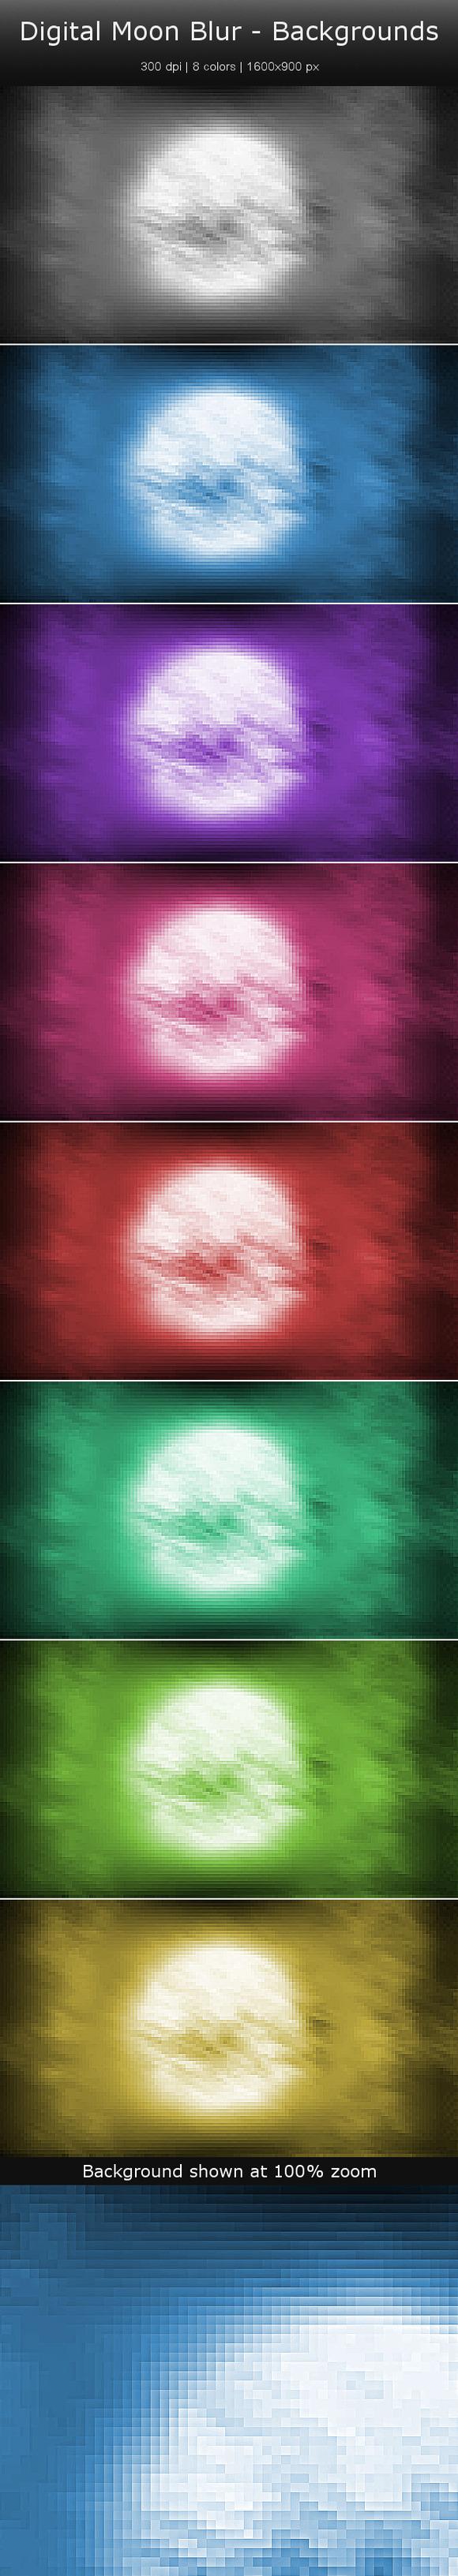 Moon Blur Backgrounds